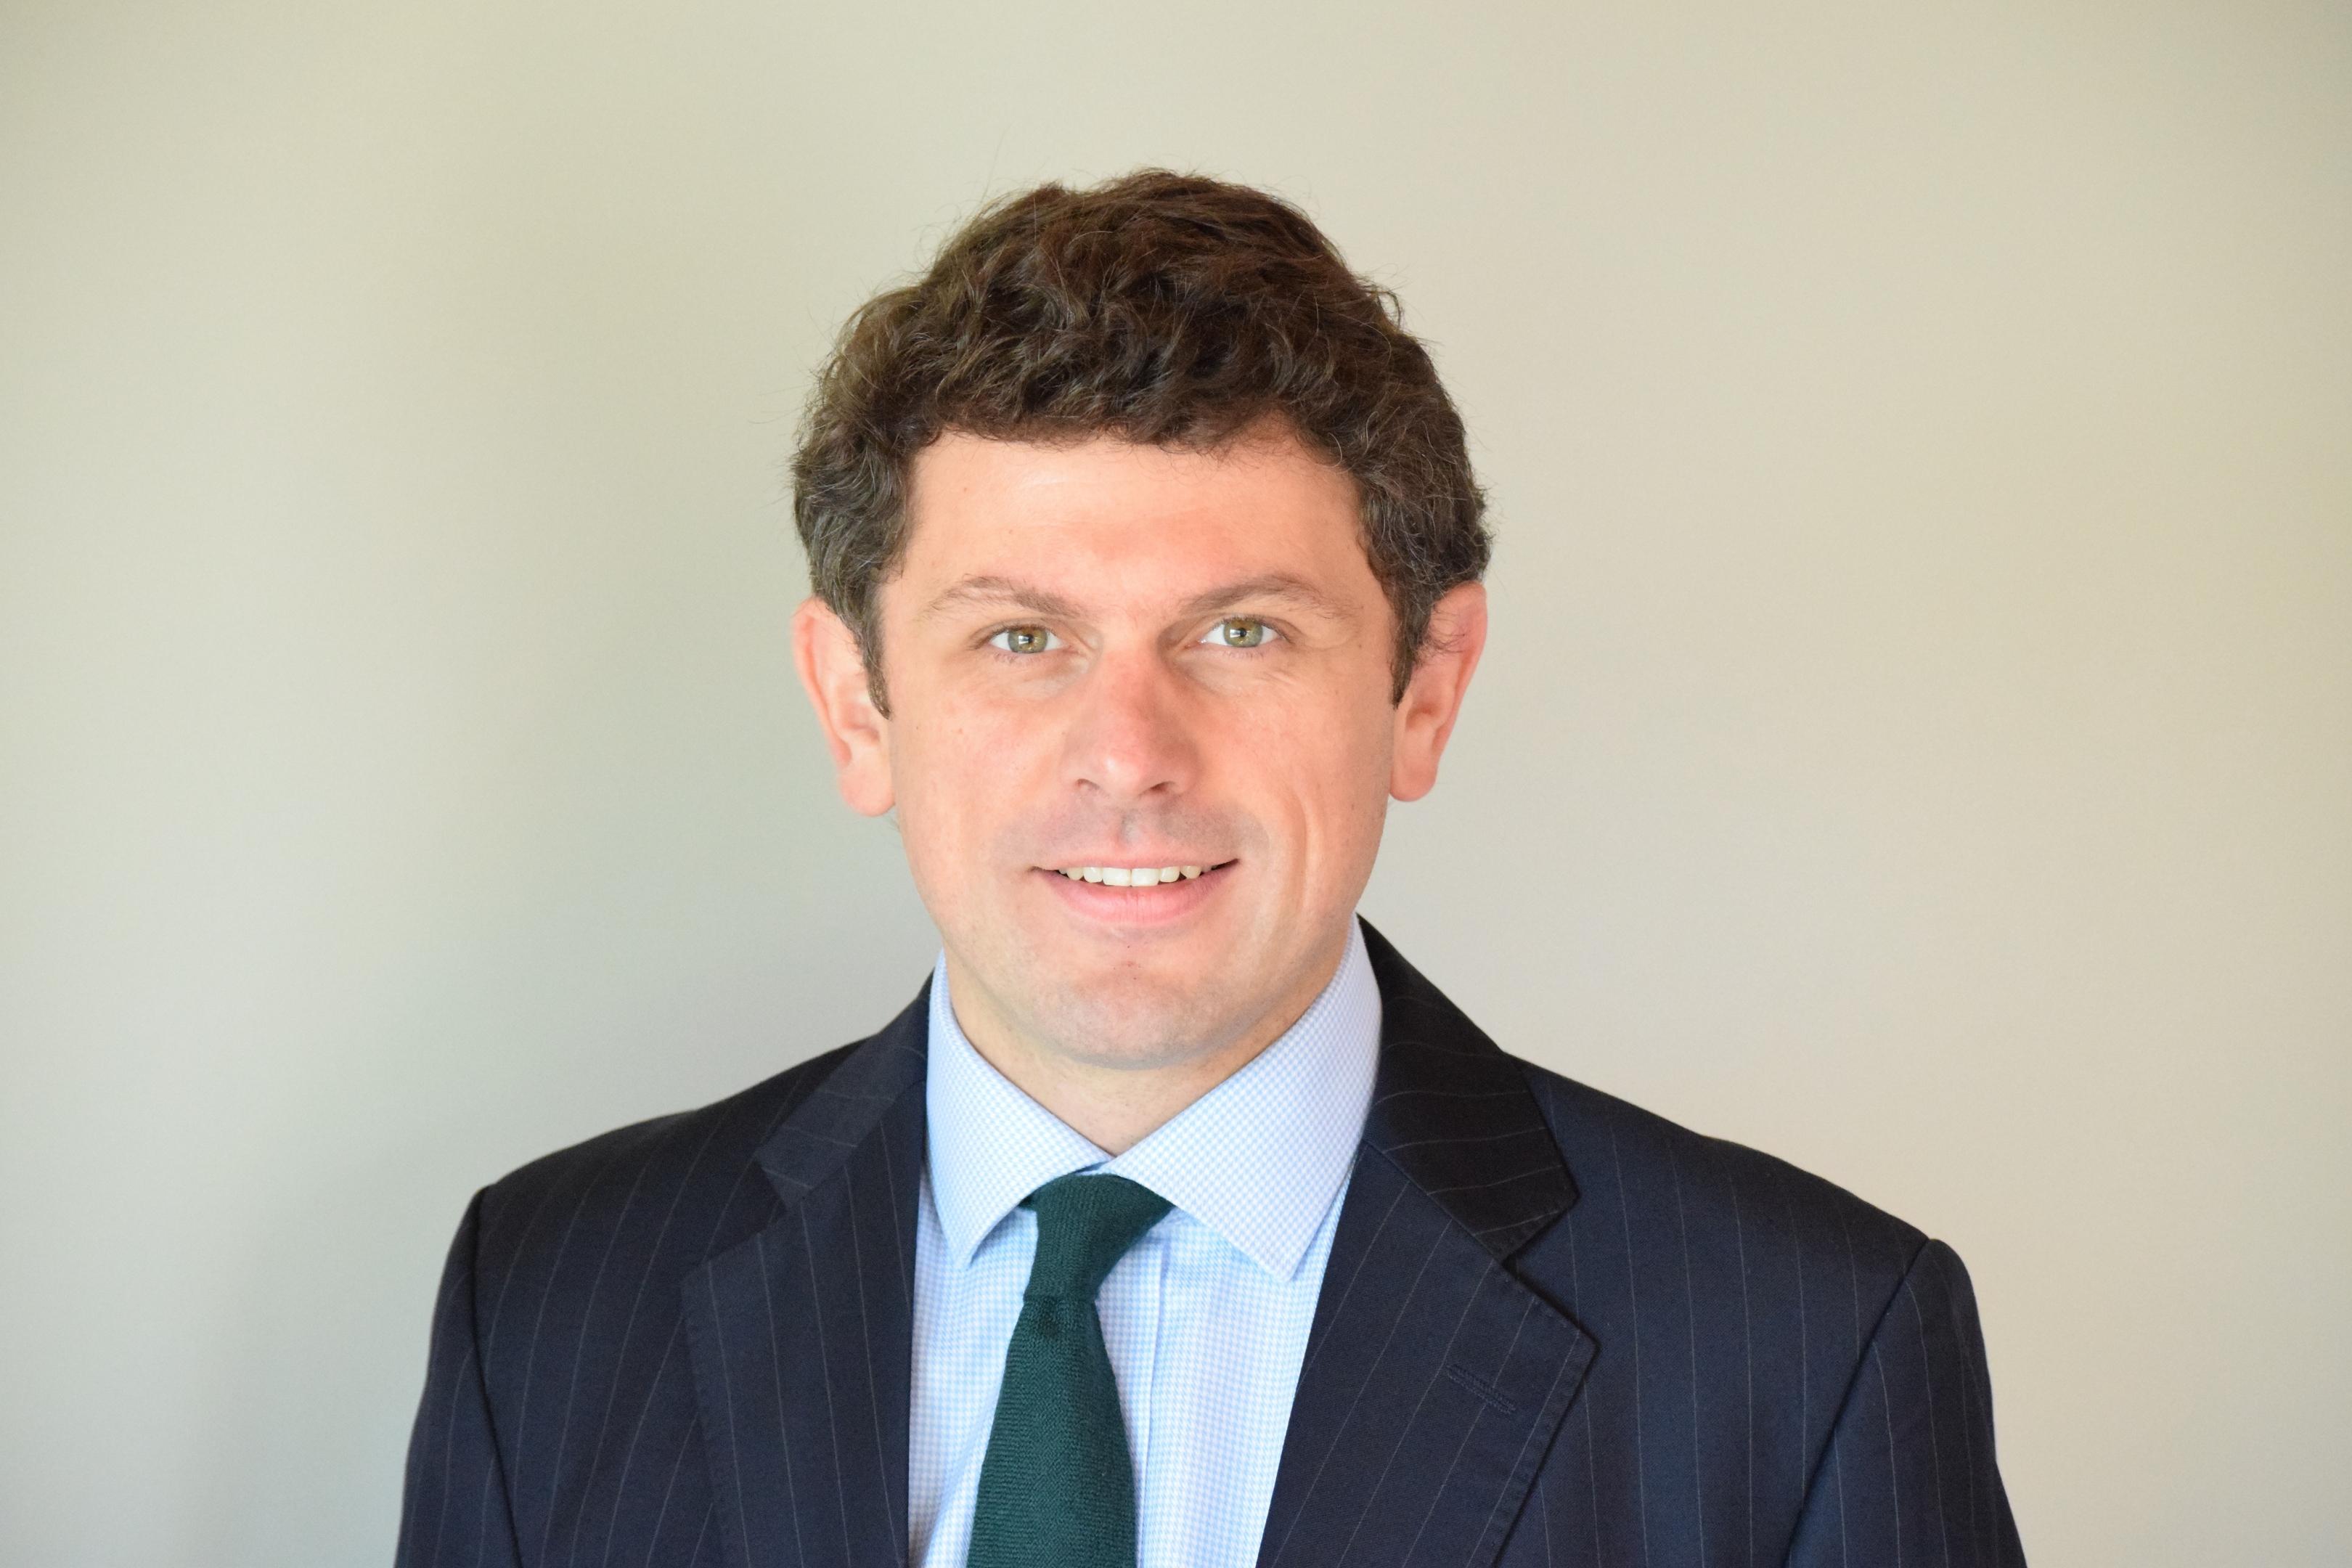 Robert MacKenzie - Conservative